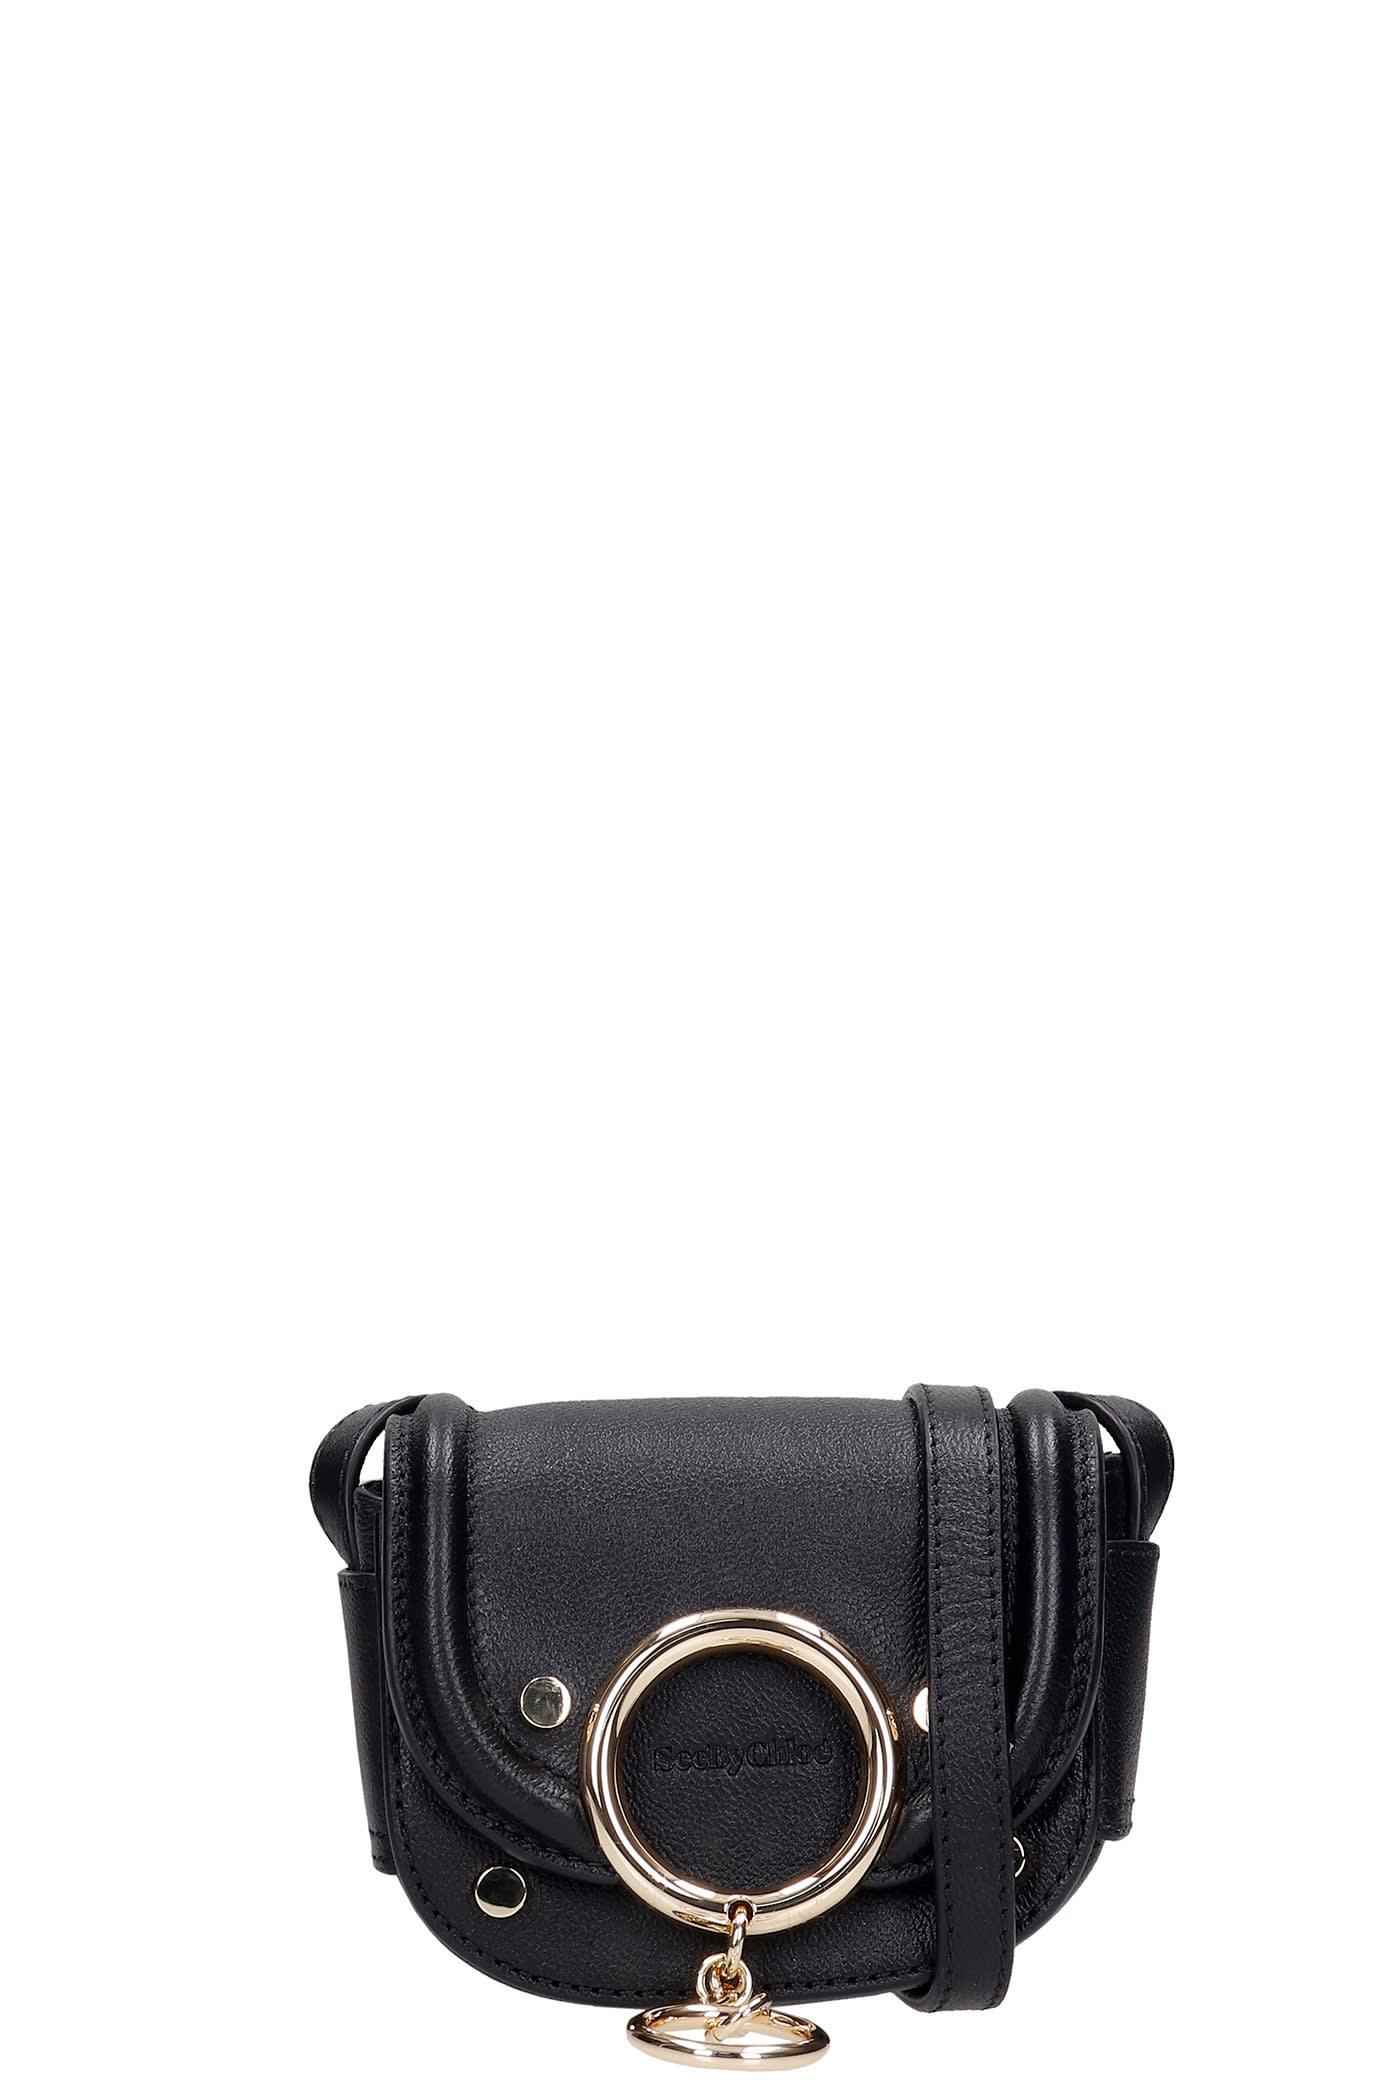 See by Chloé Hana Shoulder Bag In Black Leather